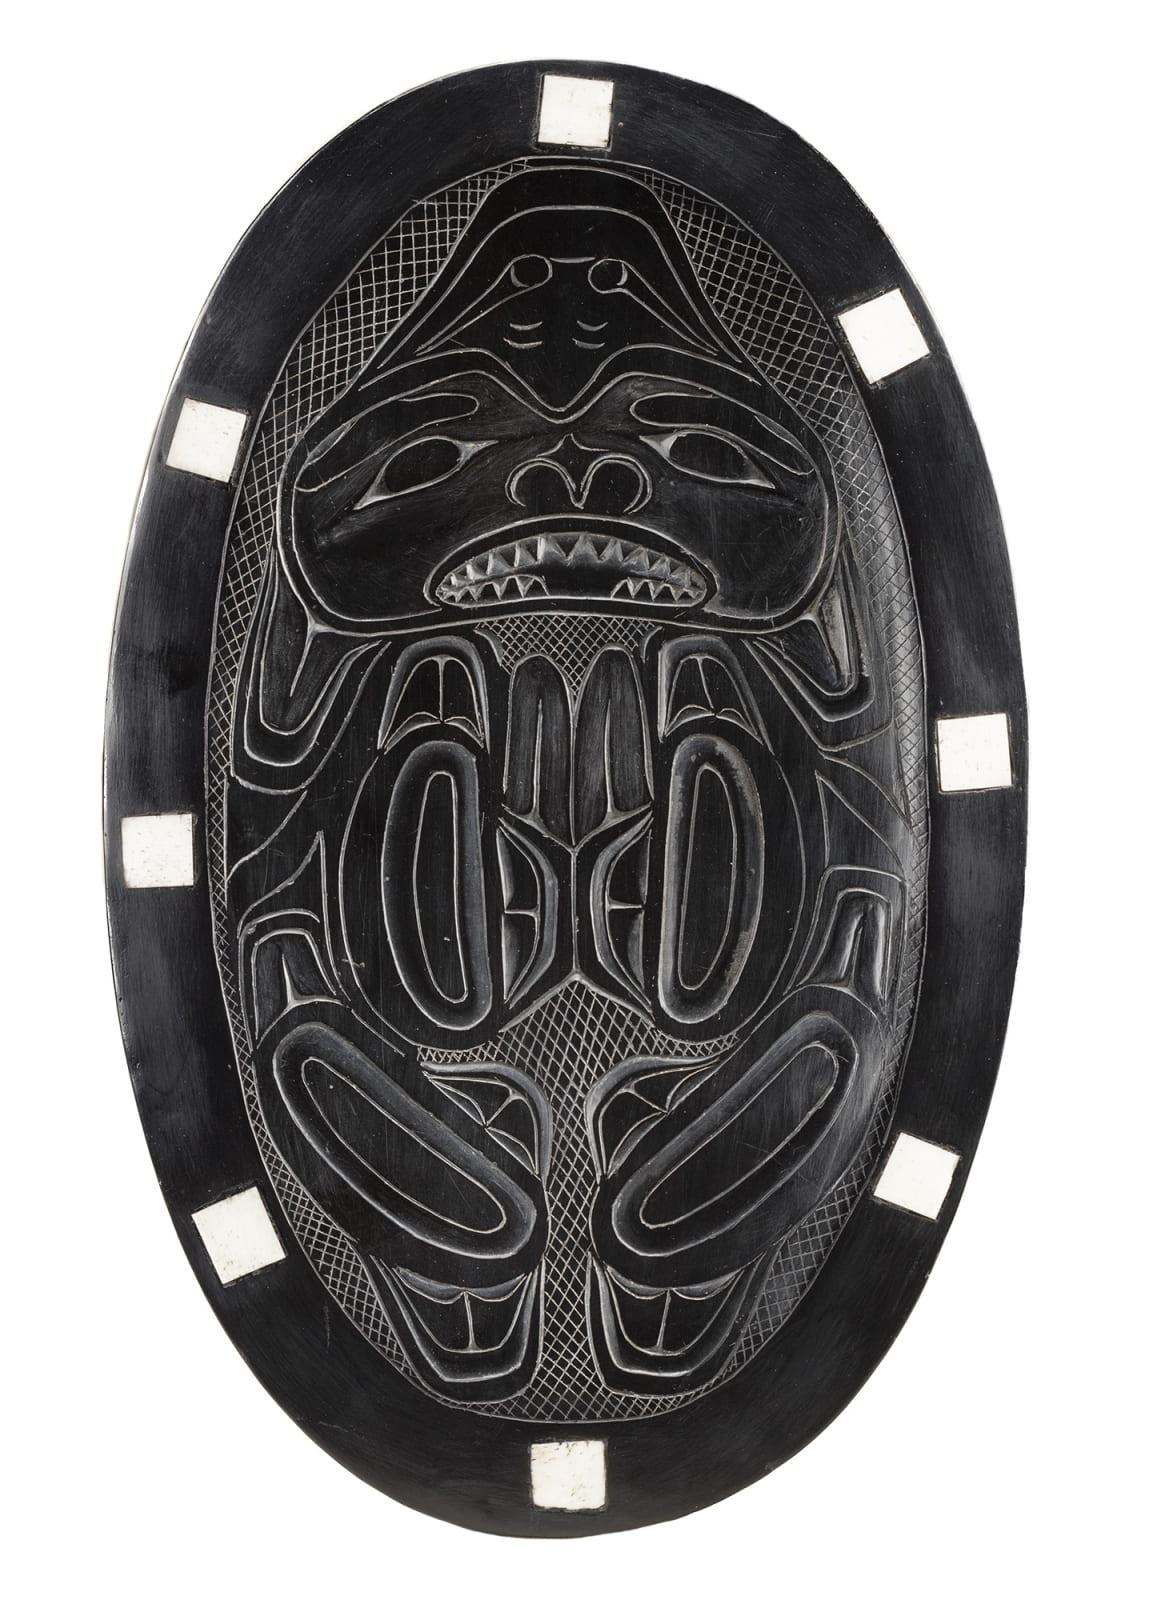 Lot 54 UNIDENTIFIED ARTIST, HAIDA Platter, c. 1920-1950 argillite and bone, 12 x 7.5 x 1.125 in (30.5 x 19.1 x 3 cm) Estimate: $1,500 — $2,500 Price realized: $1,440